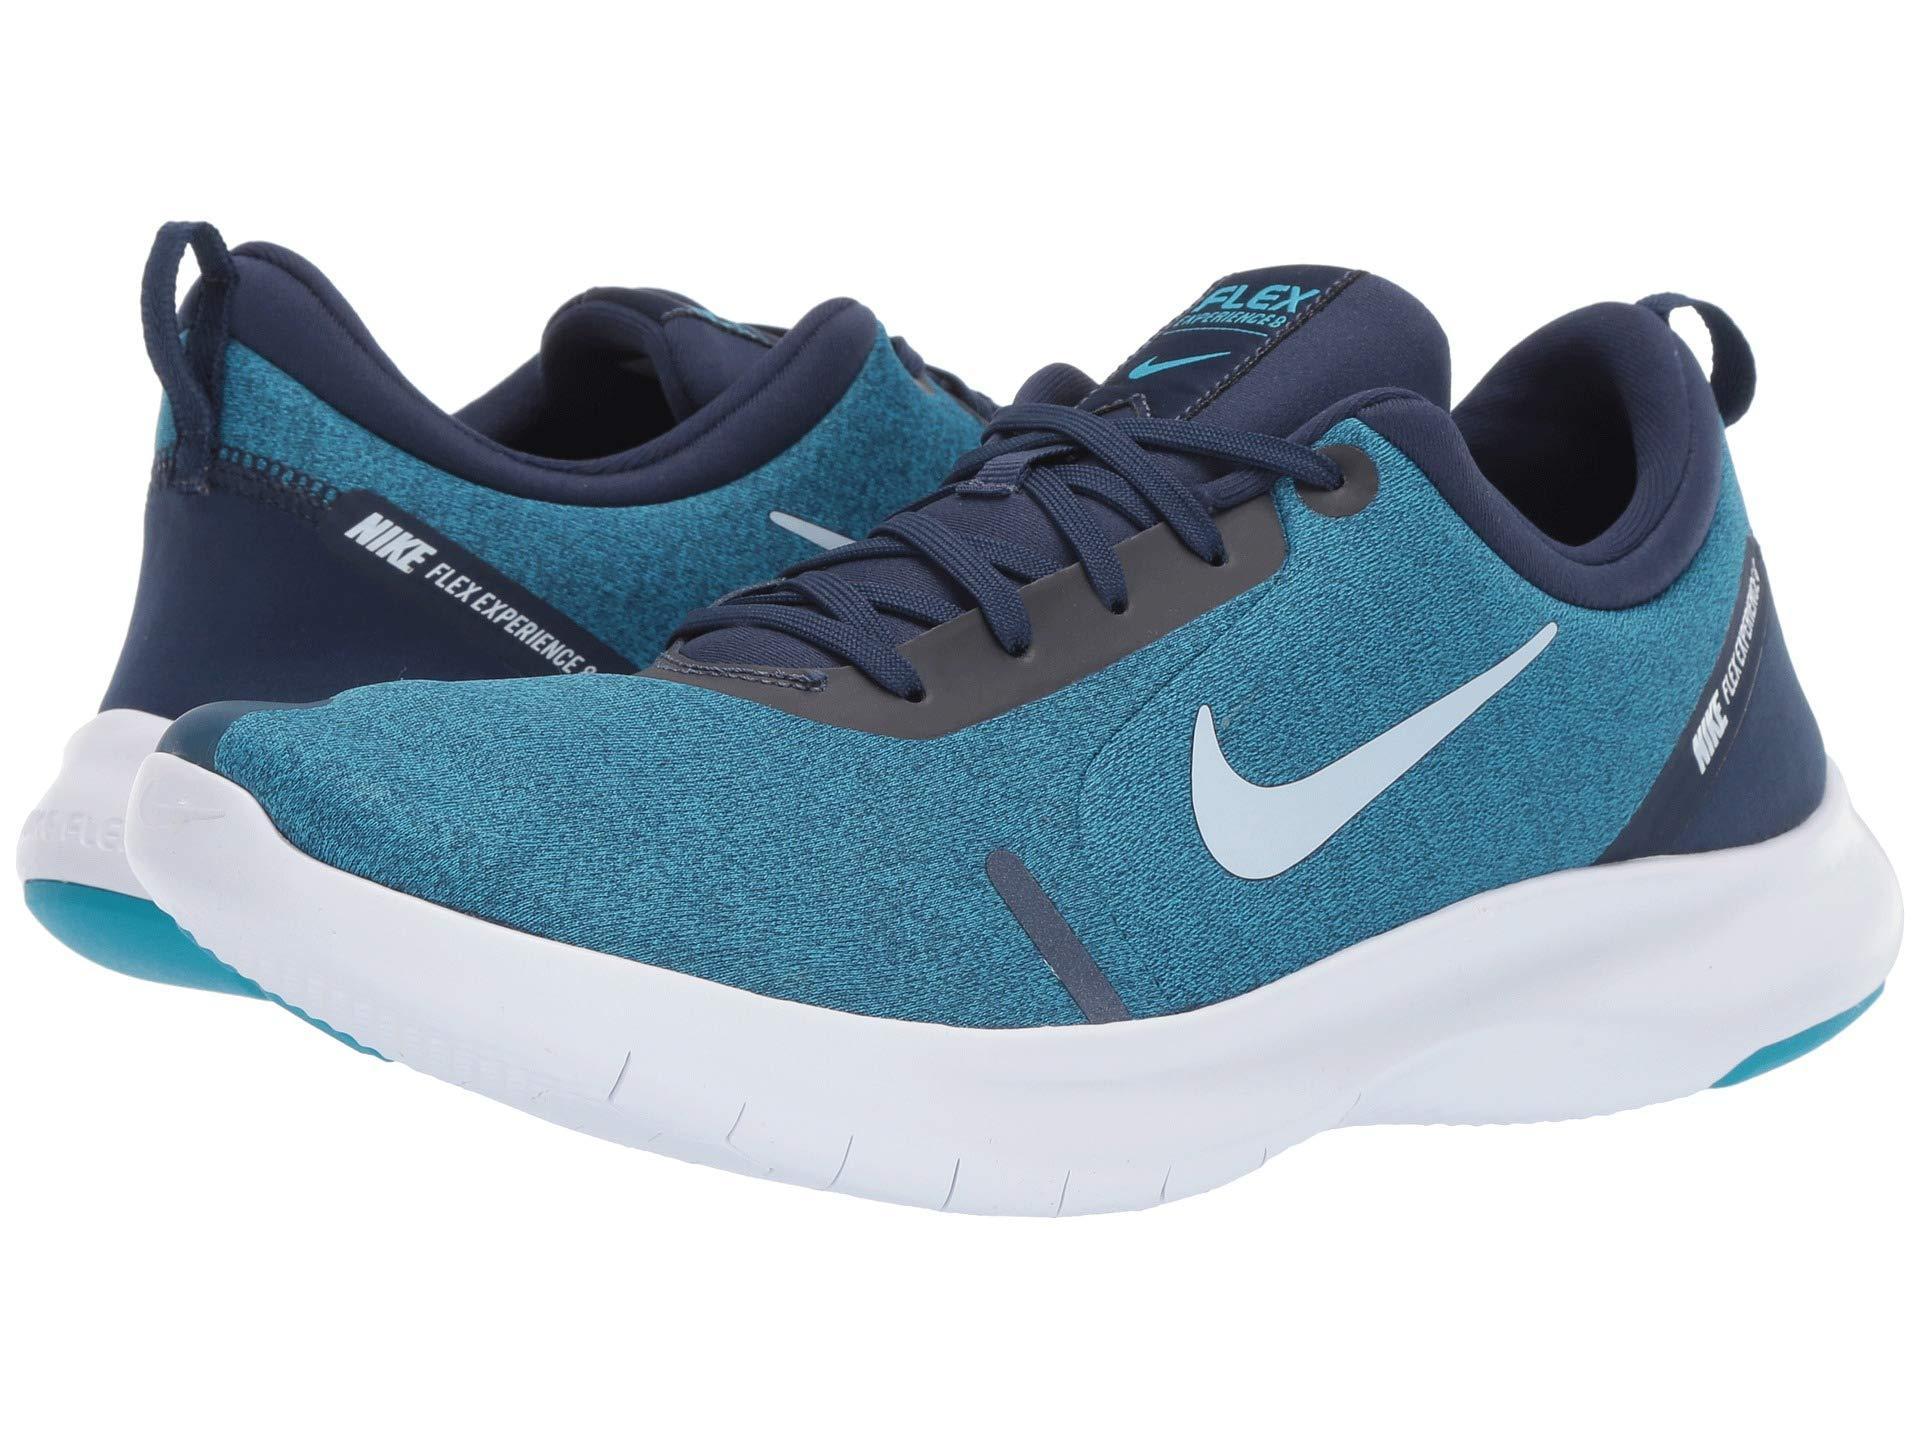 f04319c53870 Lyst - Nike Flex Experience Rn 8 (midnight Navy white monsoon Blue ...